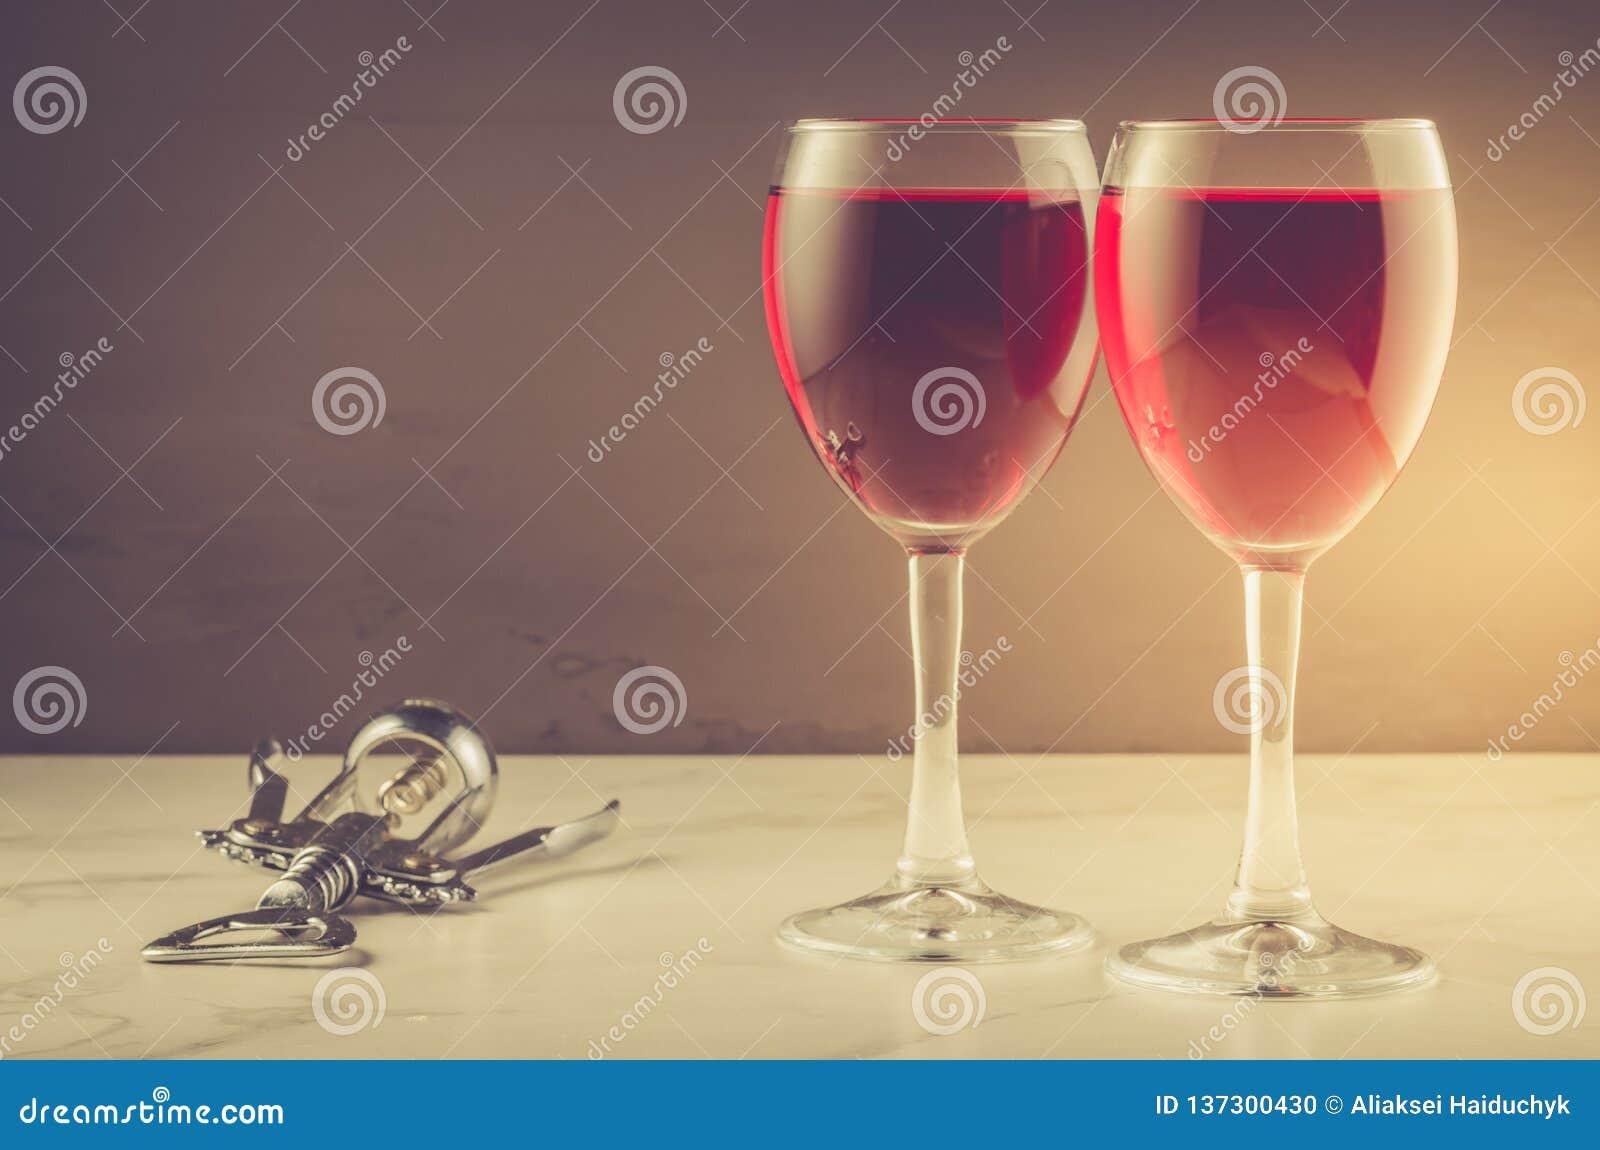 Two Wine glass and corkscrew on a dark background/ Two red Wine glass and corkscrew on a dark background. copyspace